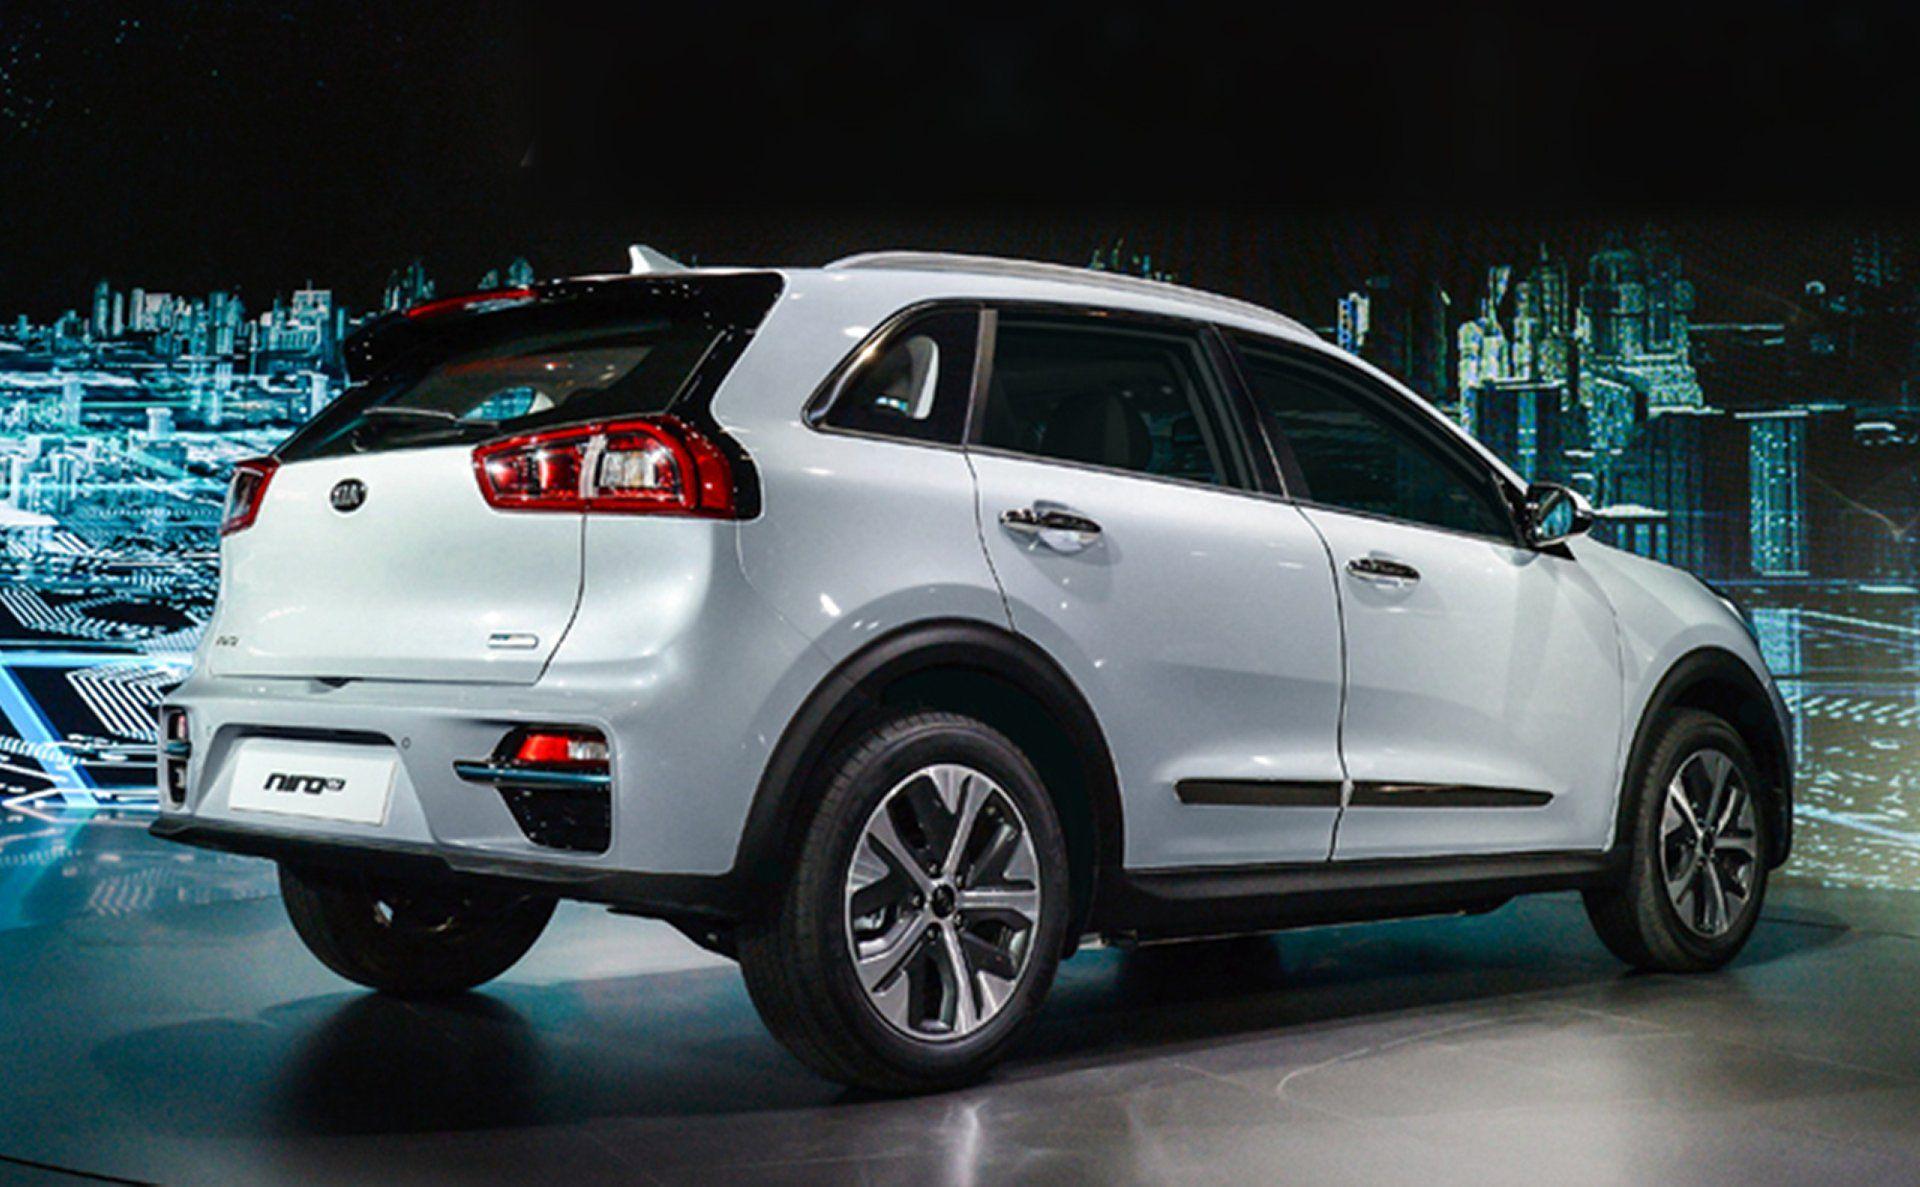 2019 Kia Nero Ev First Look Neroev 2019kia Electriccar Kia Suv Crossover Suv